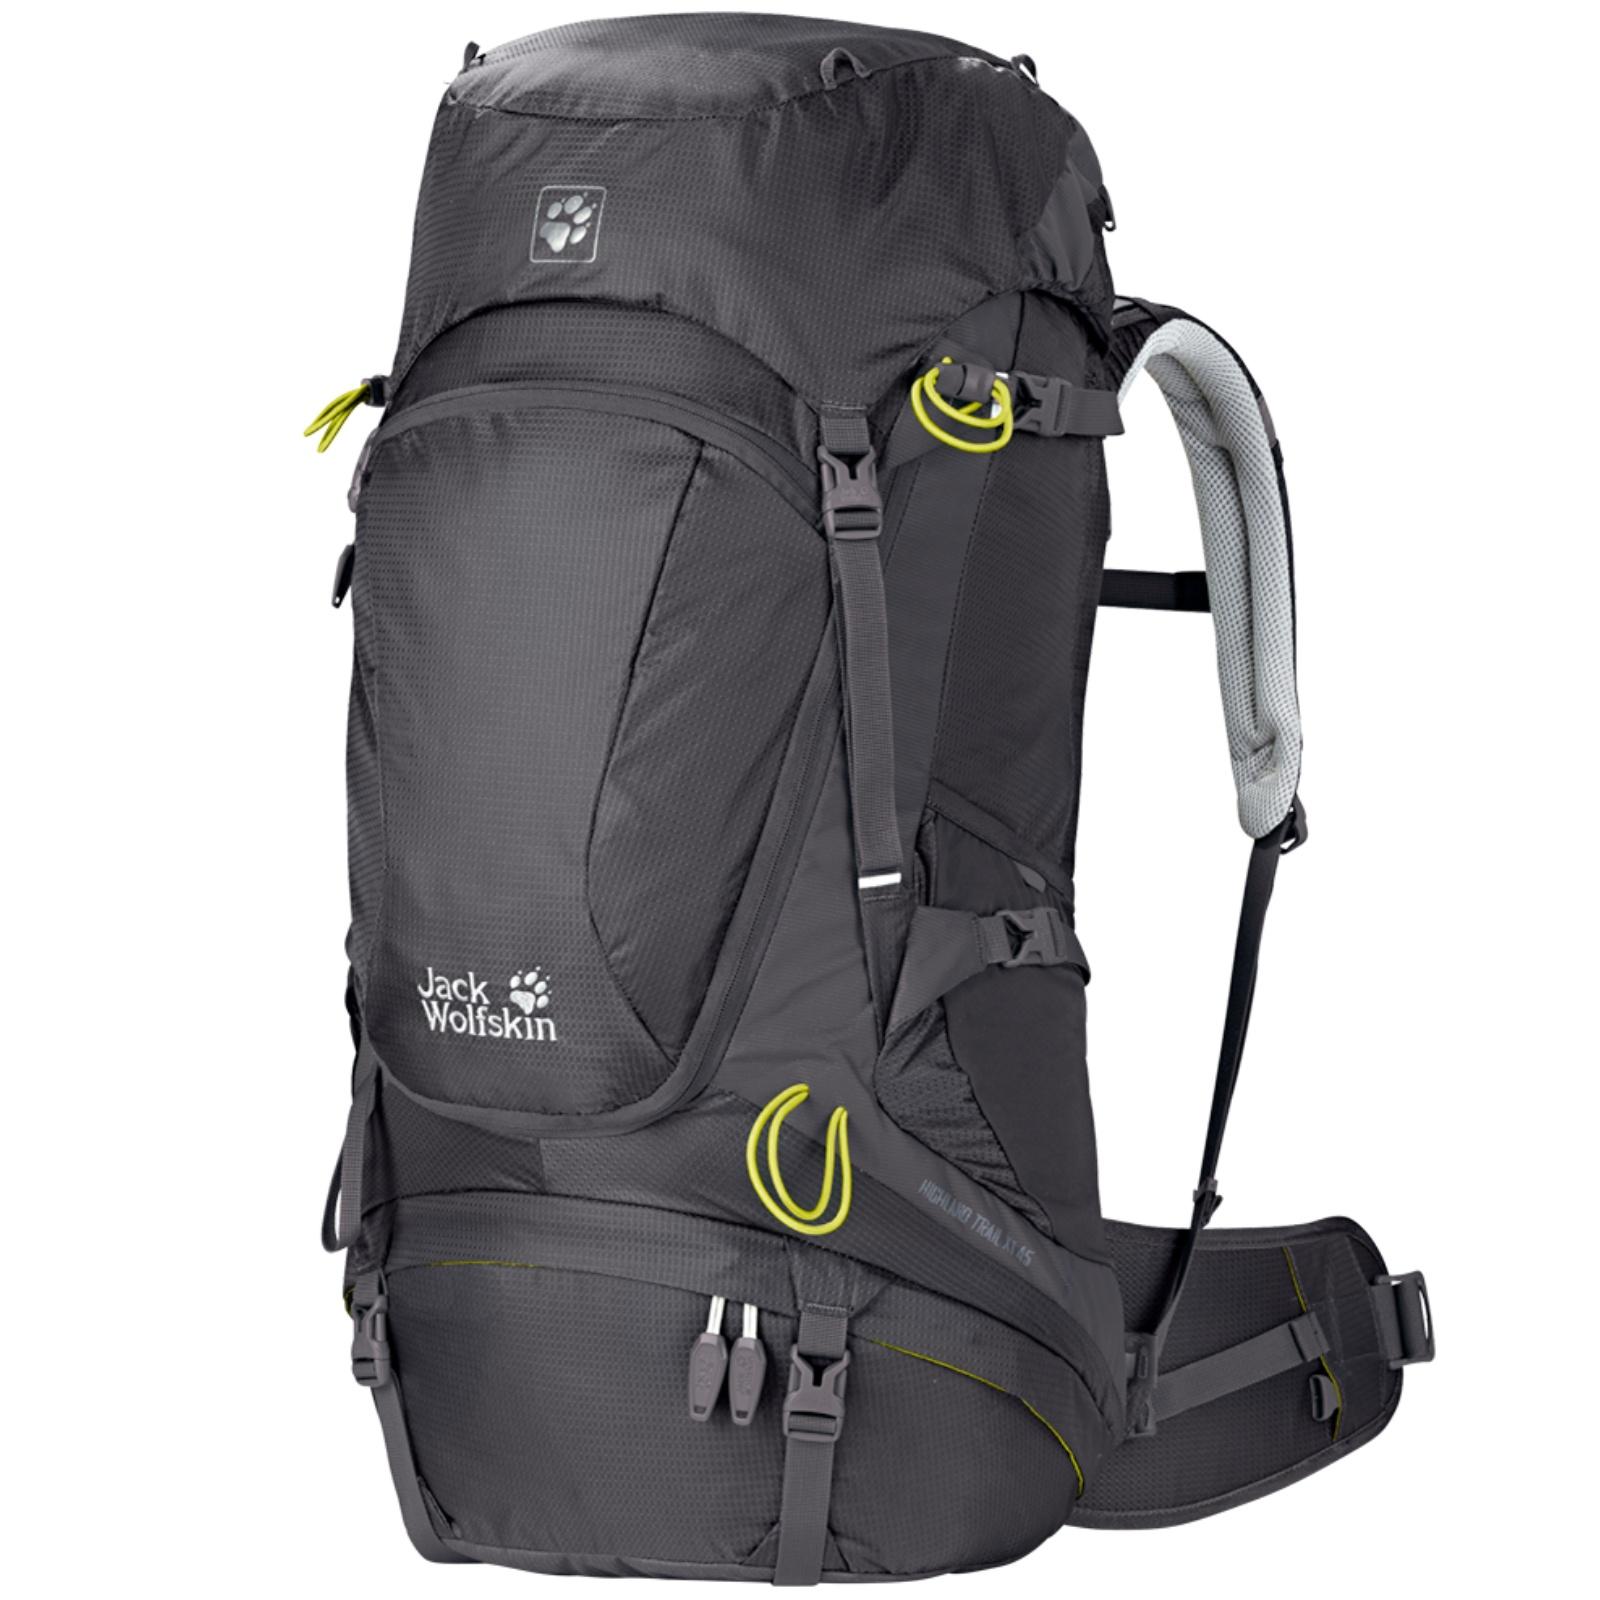 Batoh JACK WOLFSKIN Highland Trail XT 45 Women - černý